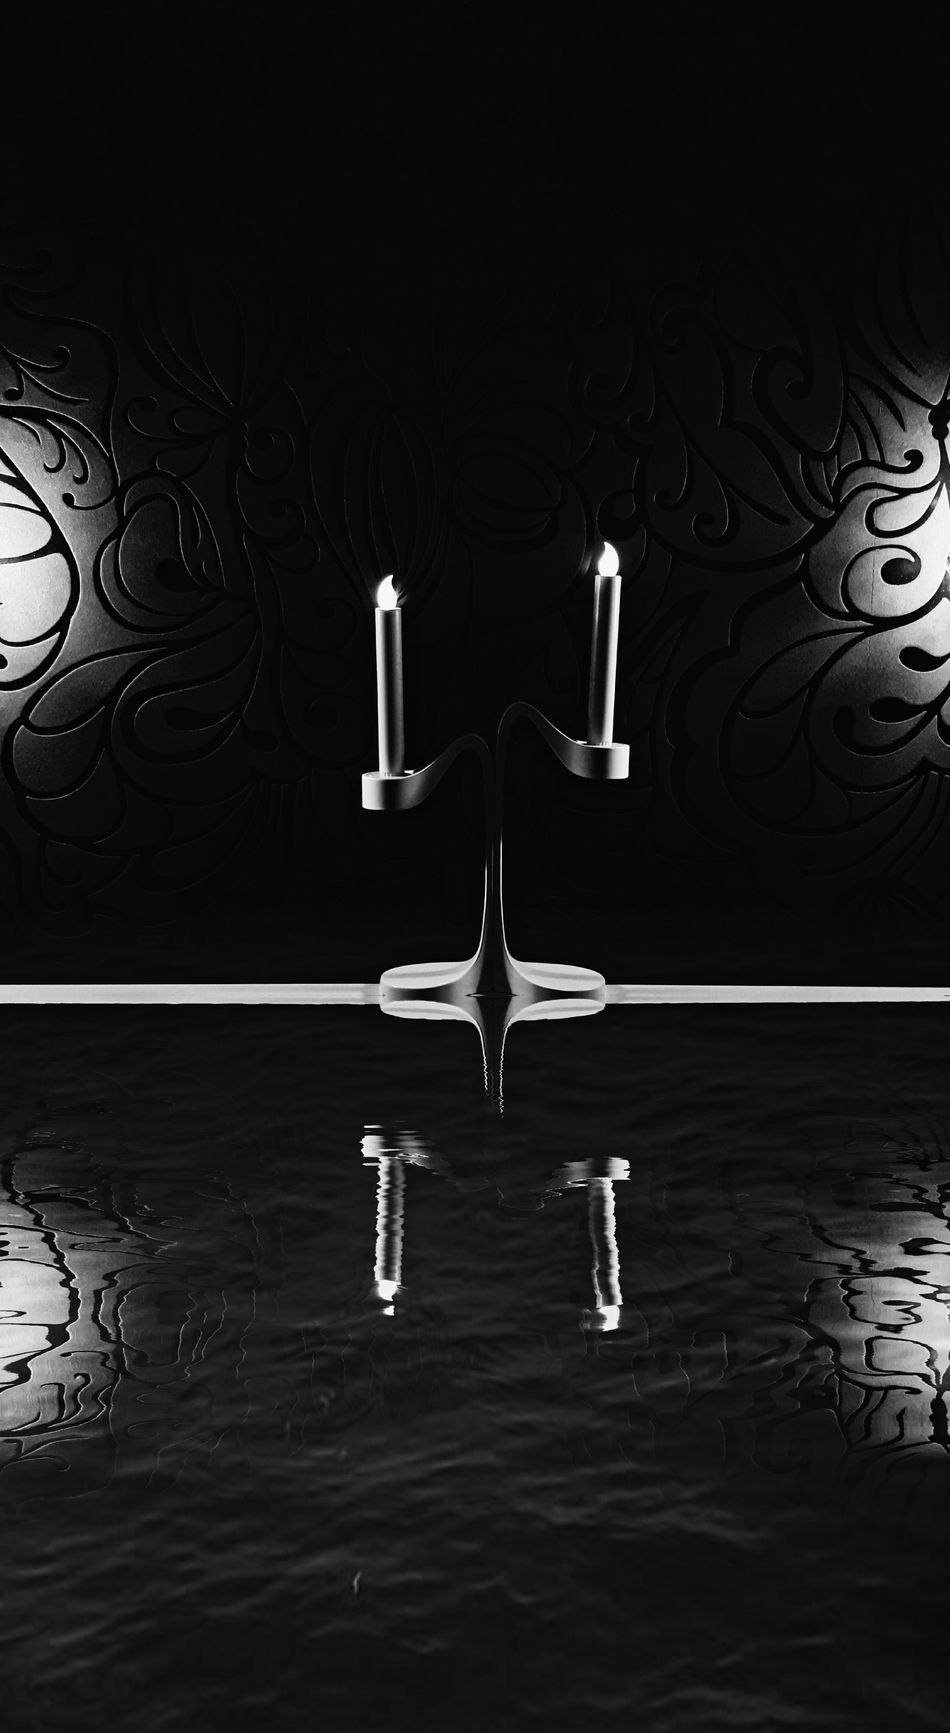 Water No People Black Background Indoors  Night Candles свечи электросвечи Blackandwhite Black And White Blackandwhite Photography Black & White чернобелое черно-белое черно-белое фото свеча вода отражение отражение в воде свет и тень Gothic